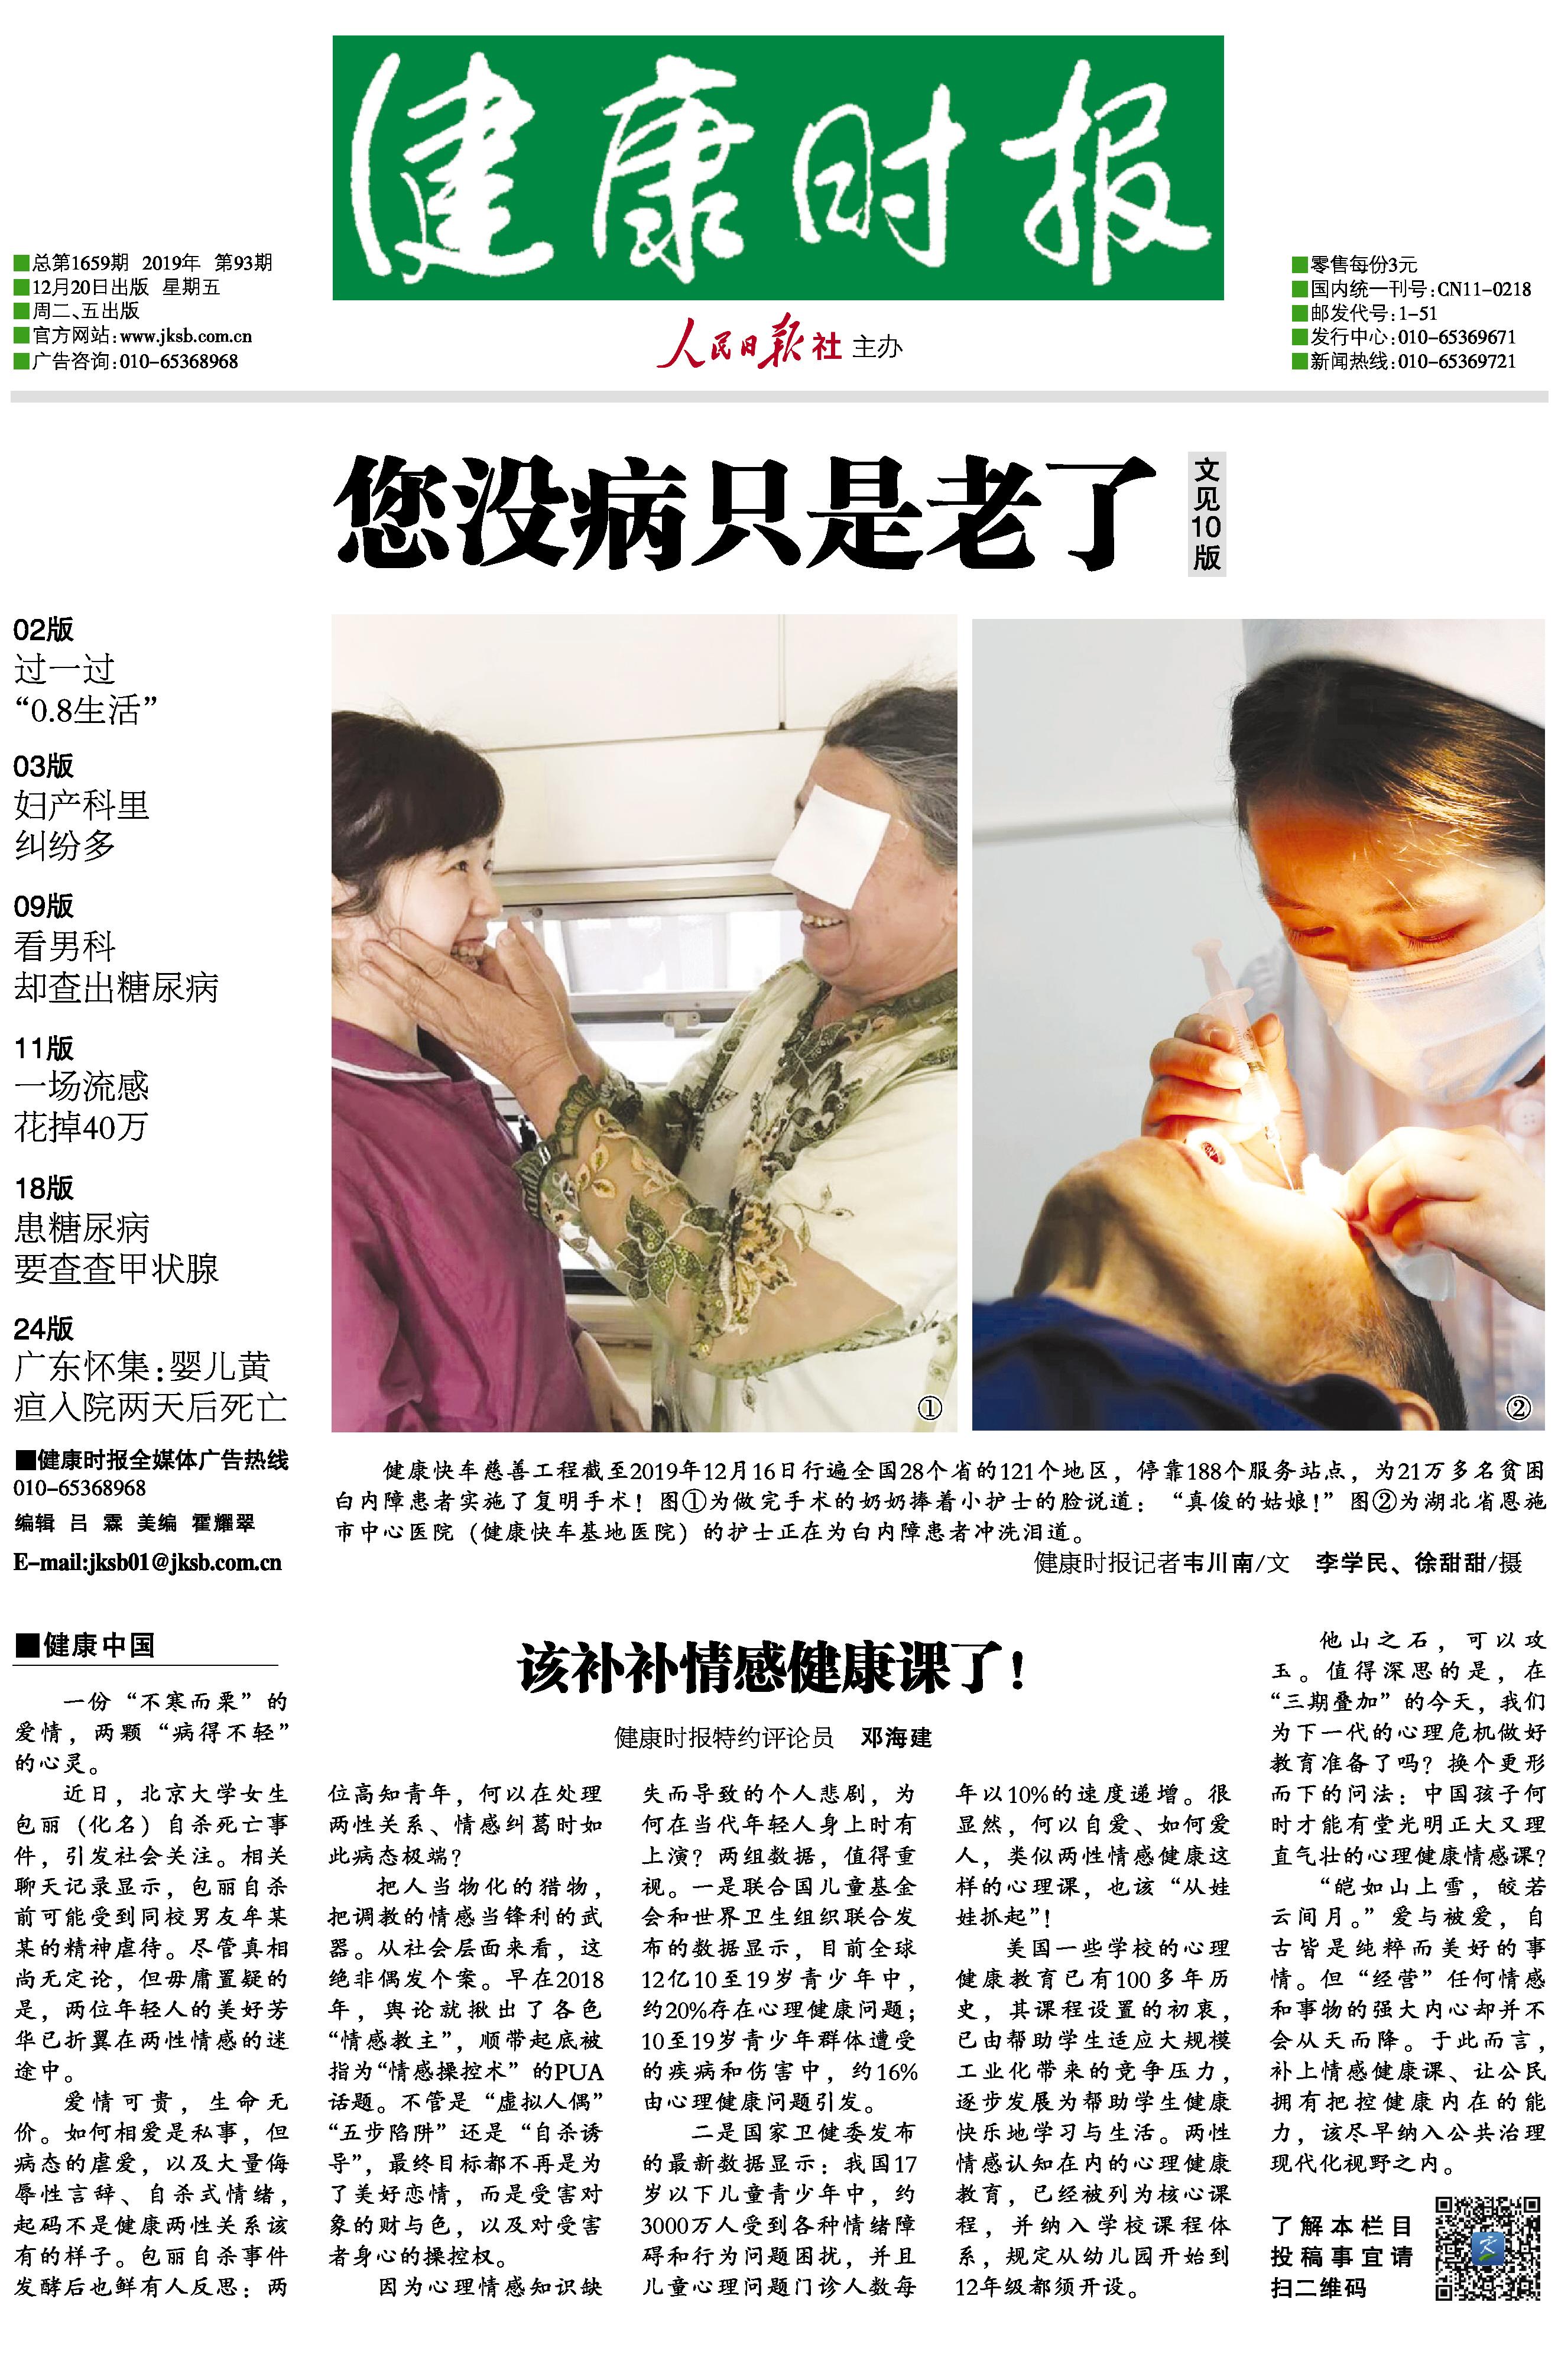 健康(kang)時報電(dian)子(zi)報